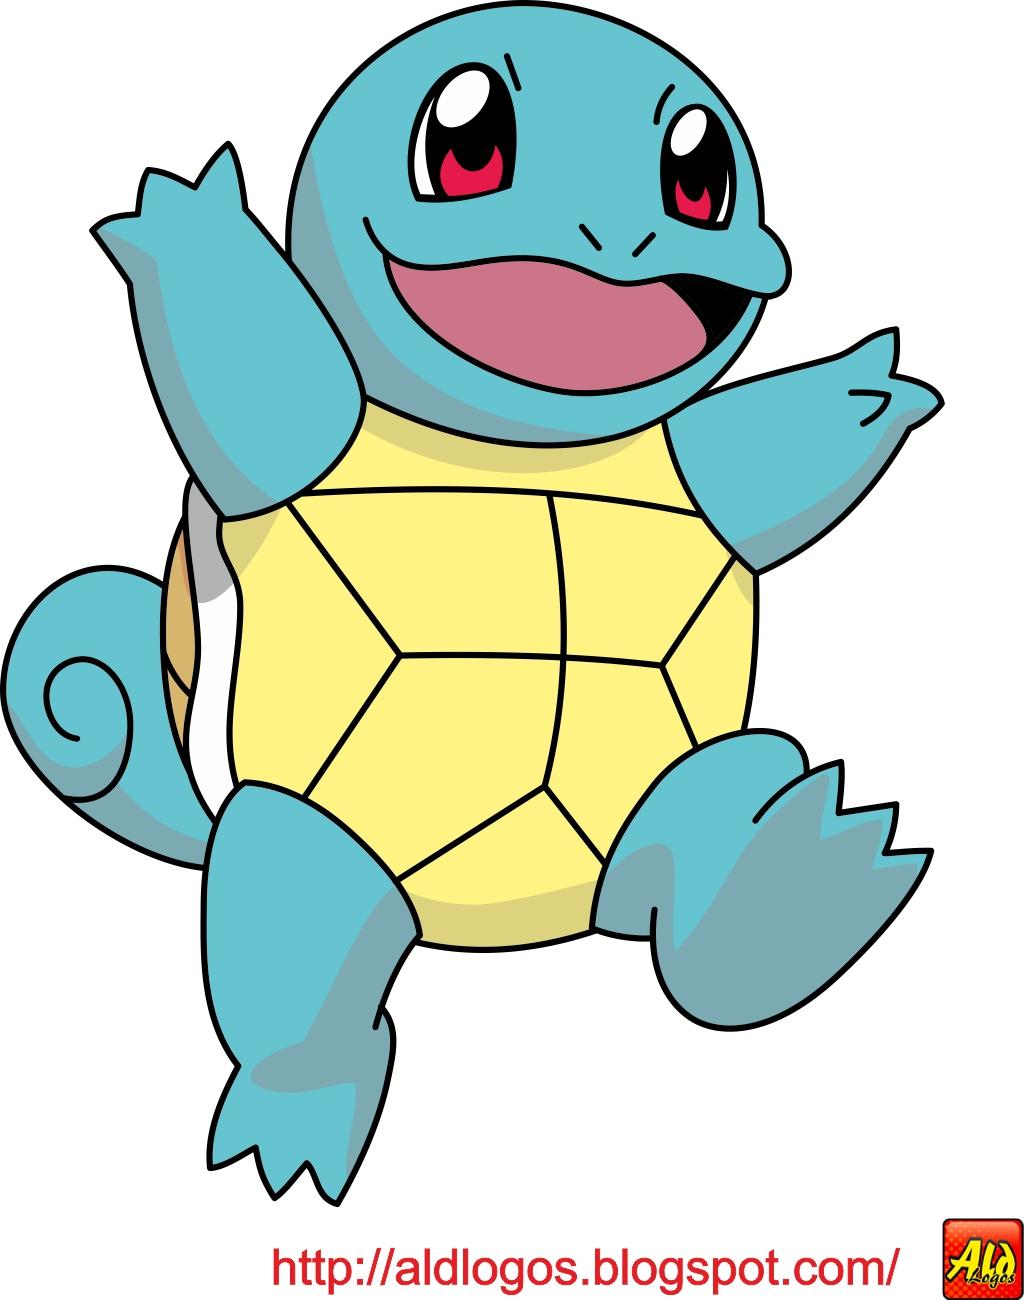 Squirtle Pokemon Logo Images | Pokemon Images